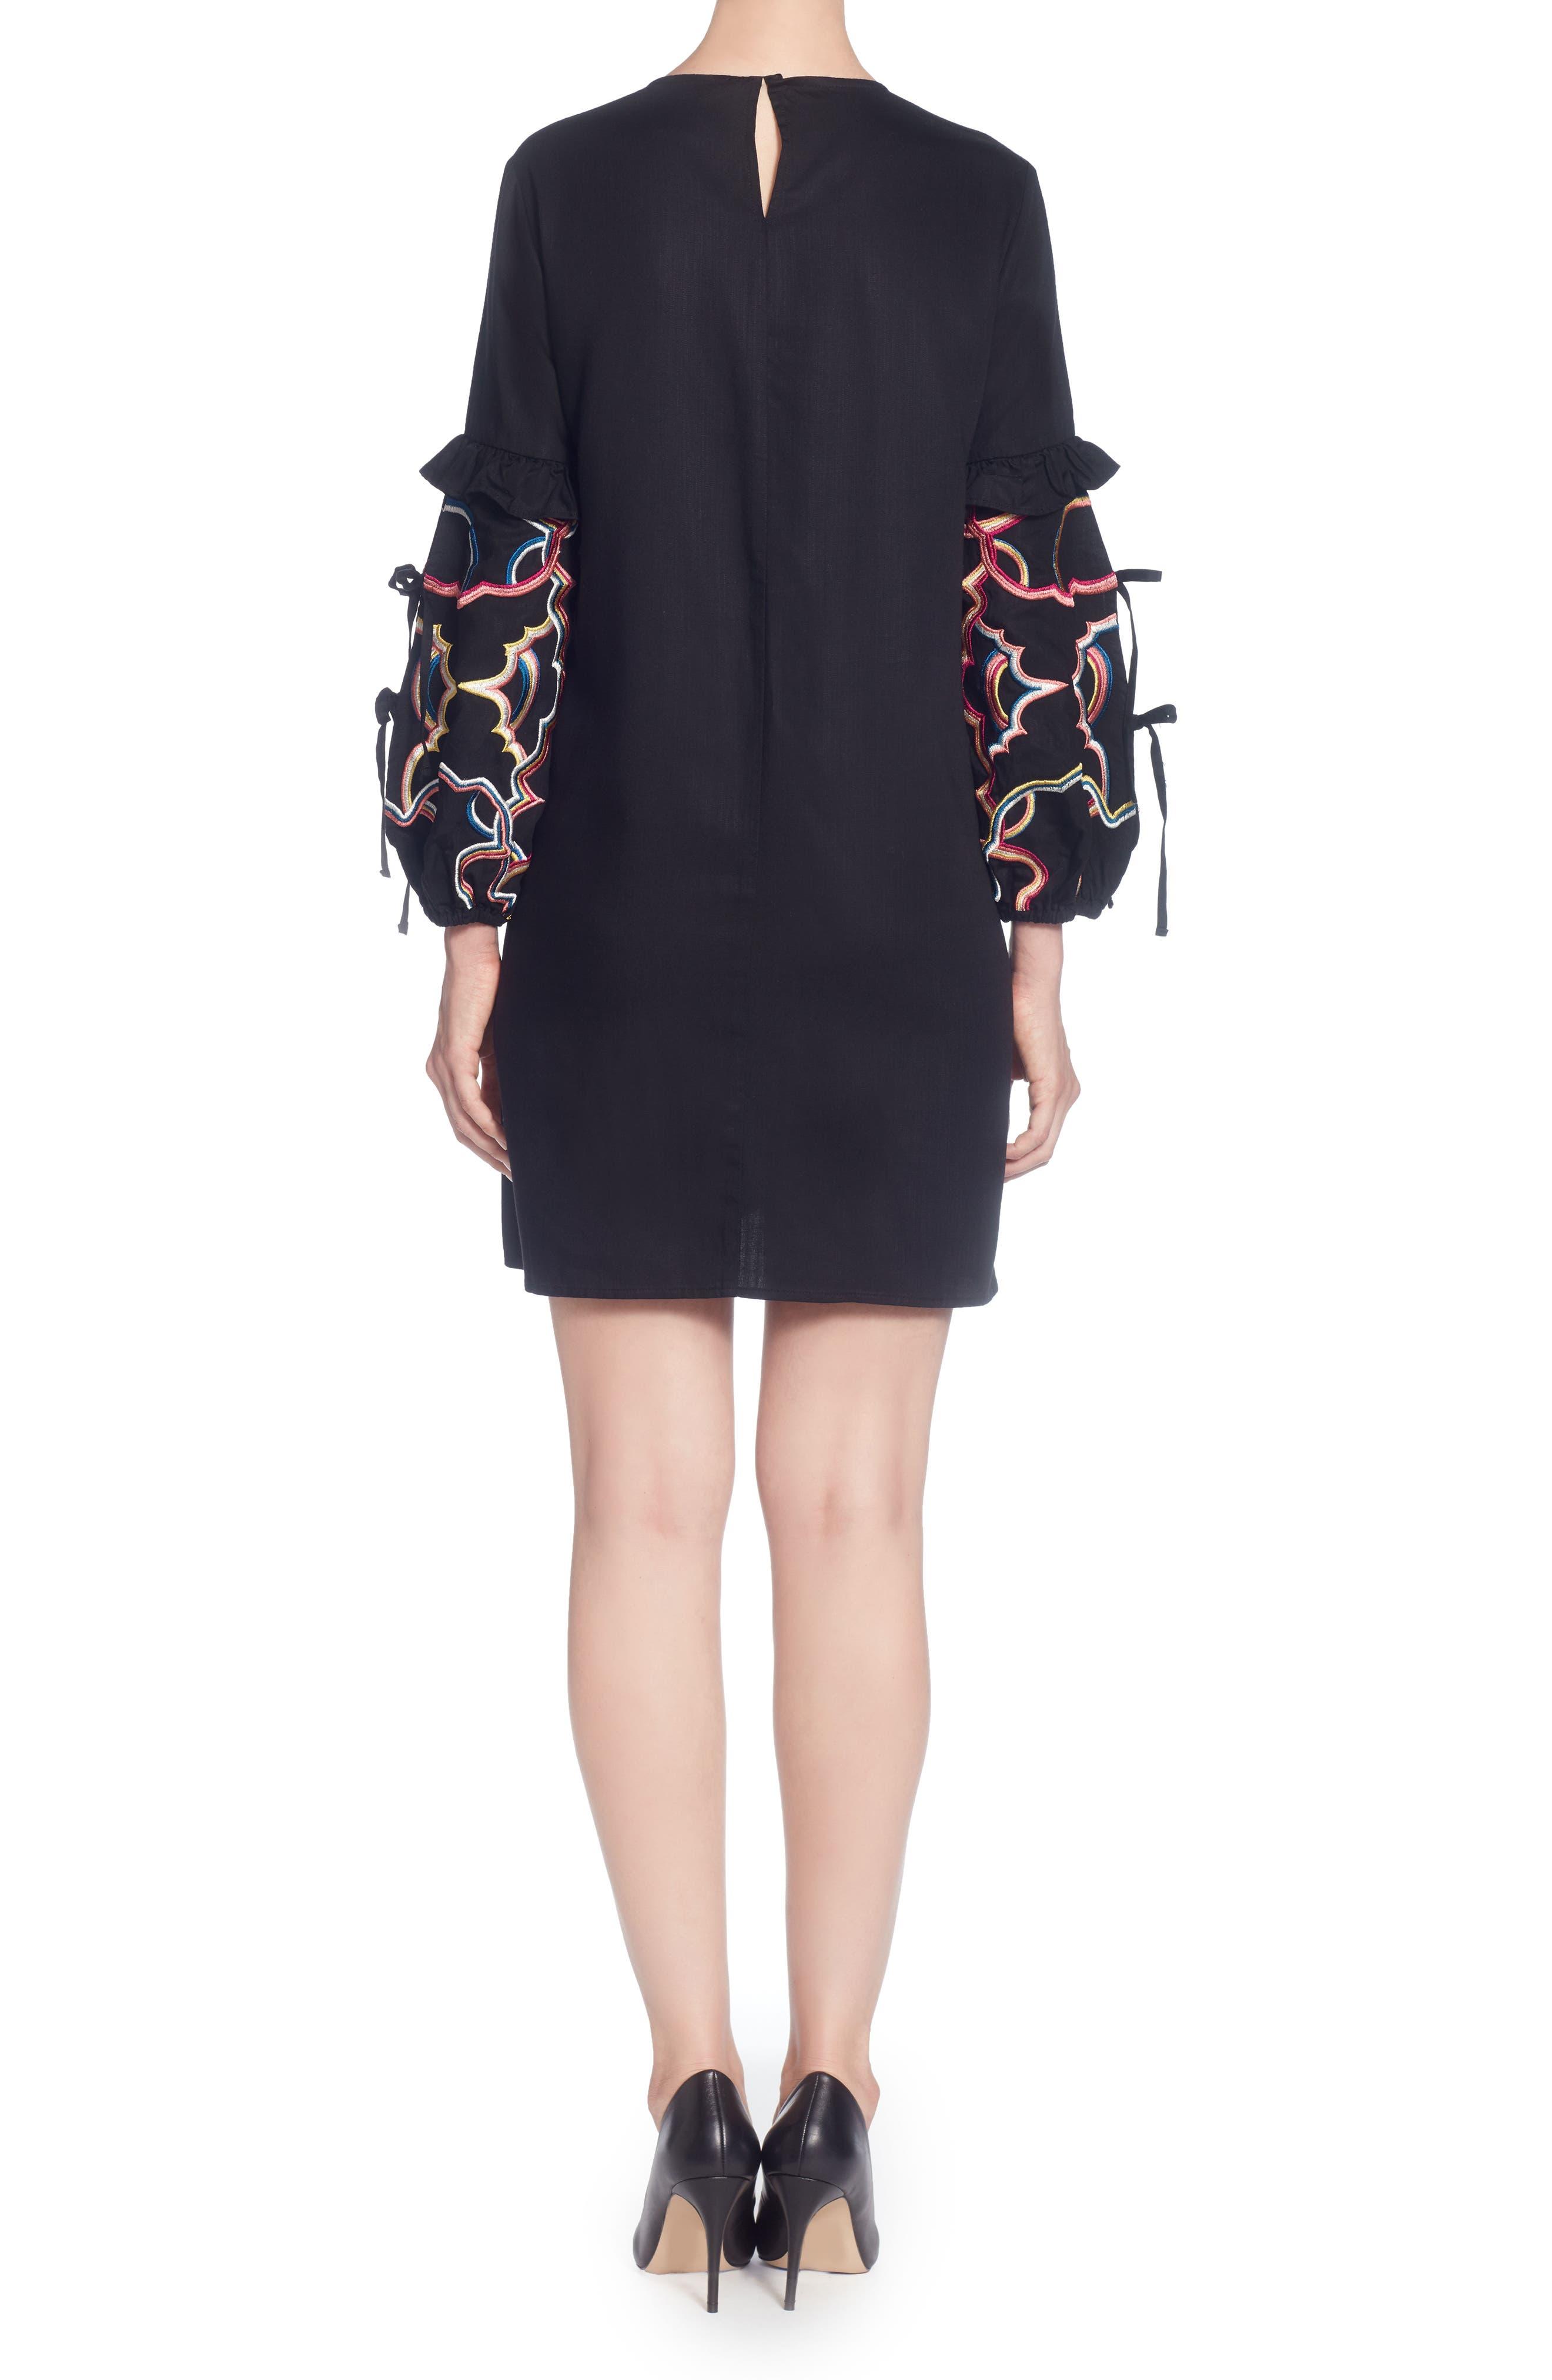 Dahl Embroidered Sleeve Dress,                             Alternate thumbnail 2, color,                             Black